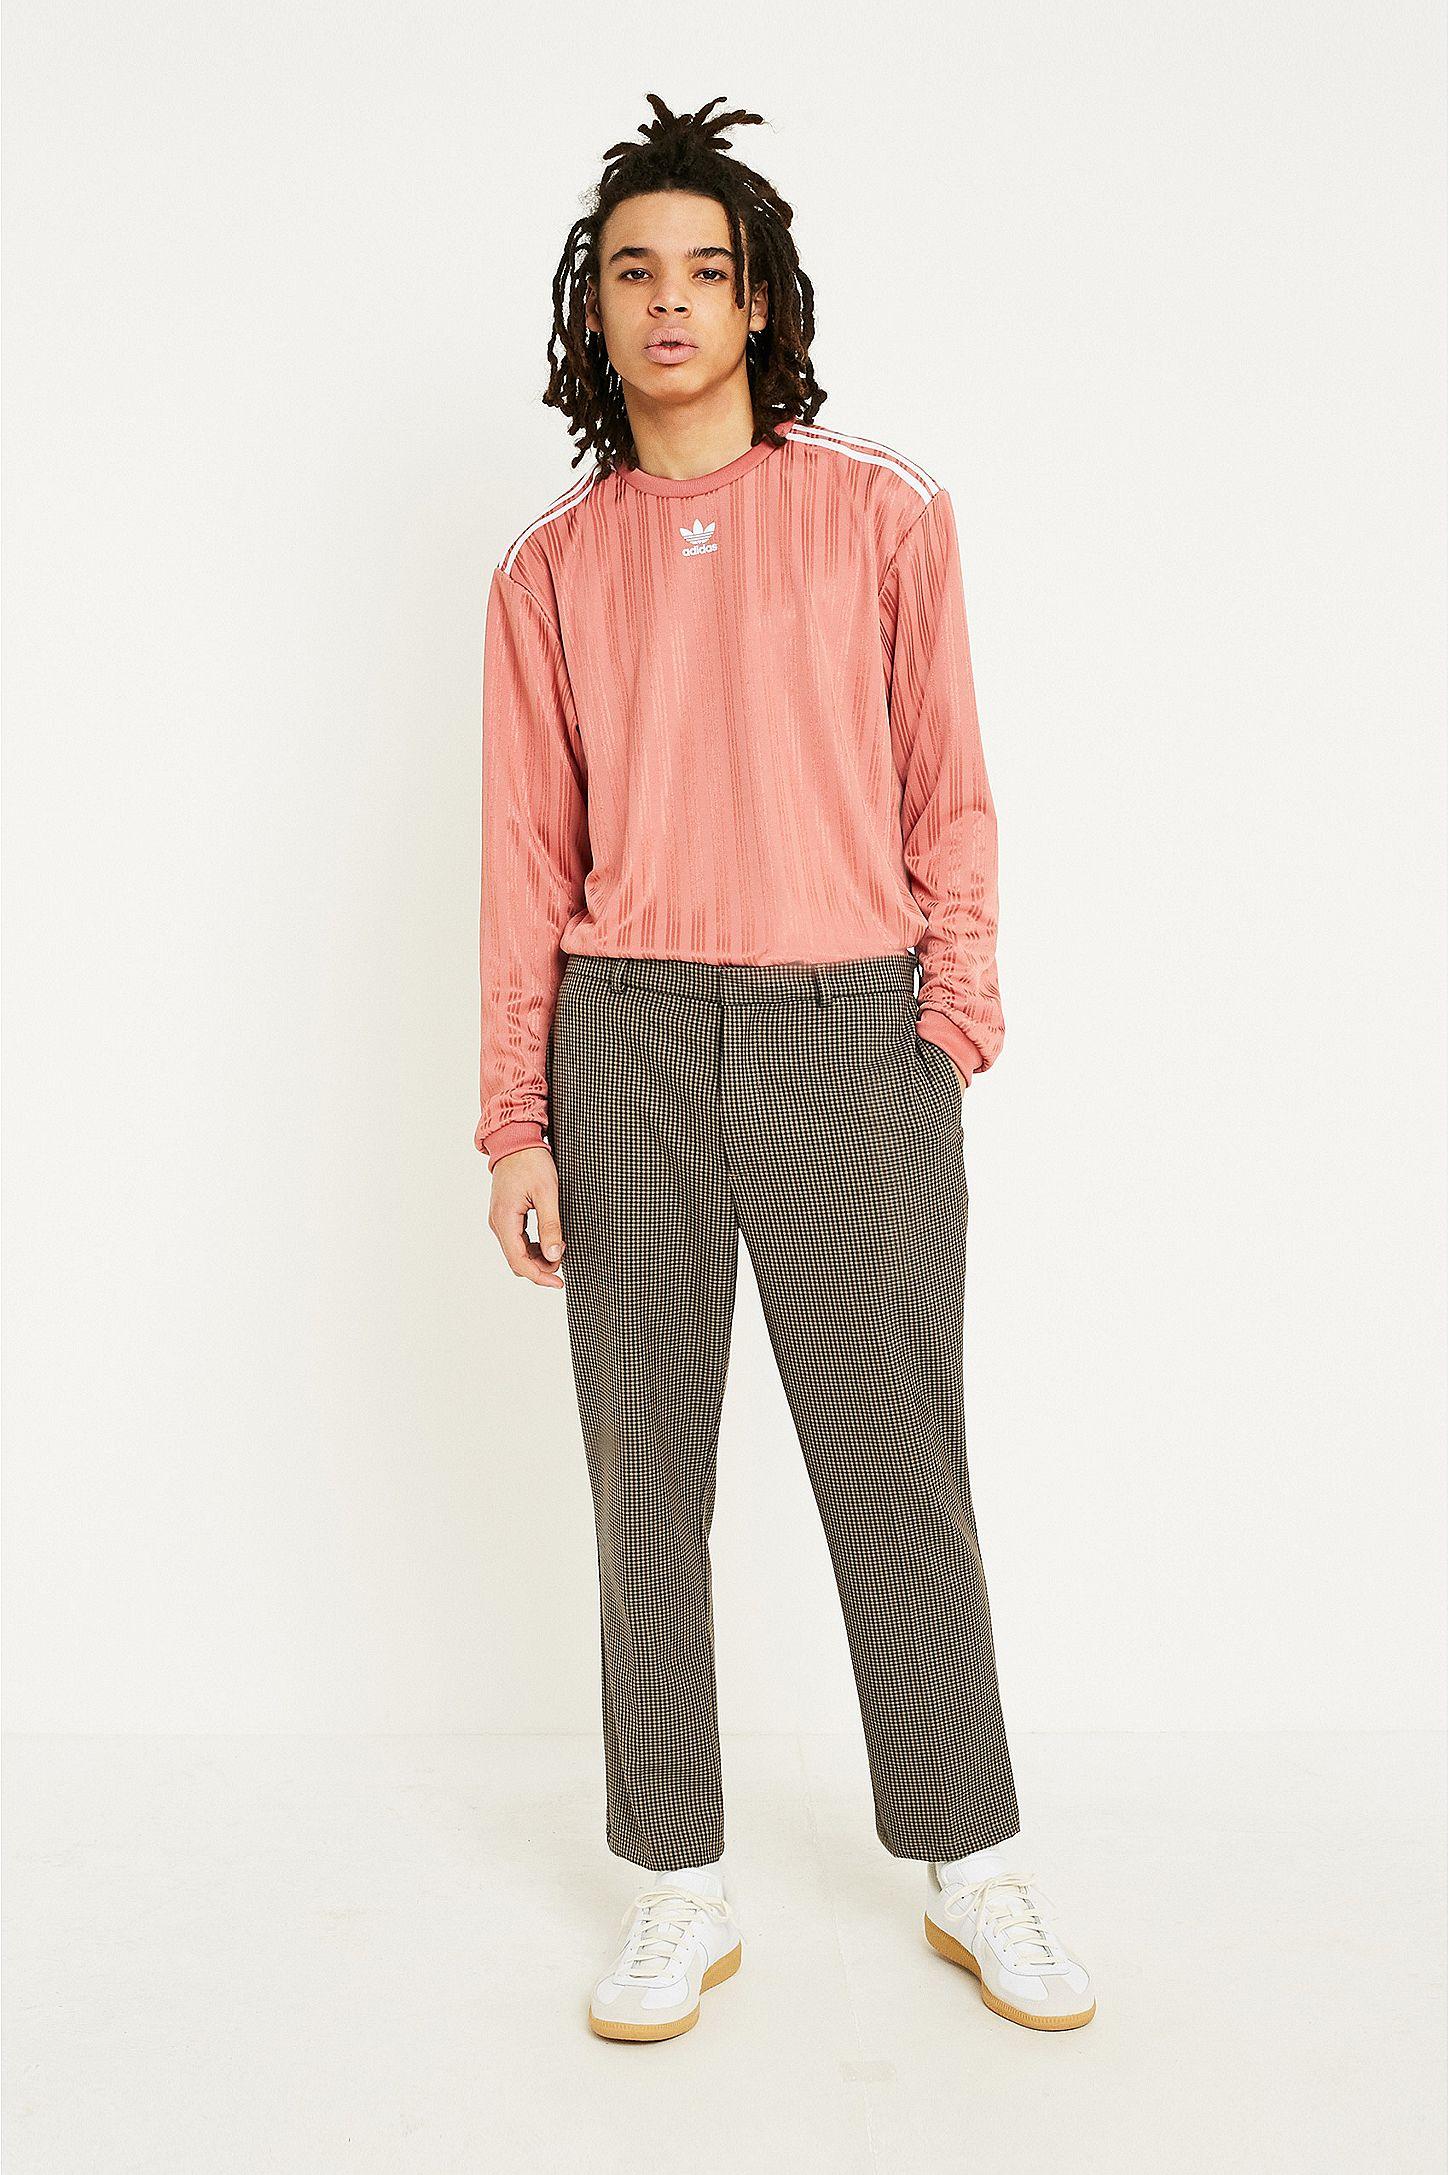 d2917f84fd55 adidas Dusty Pink Long-Sleeve Football Jersey Top